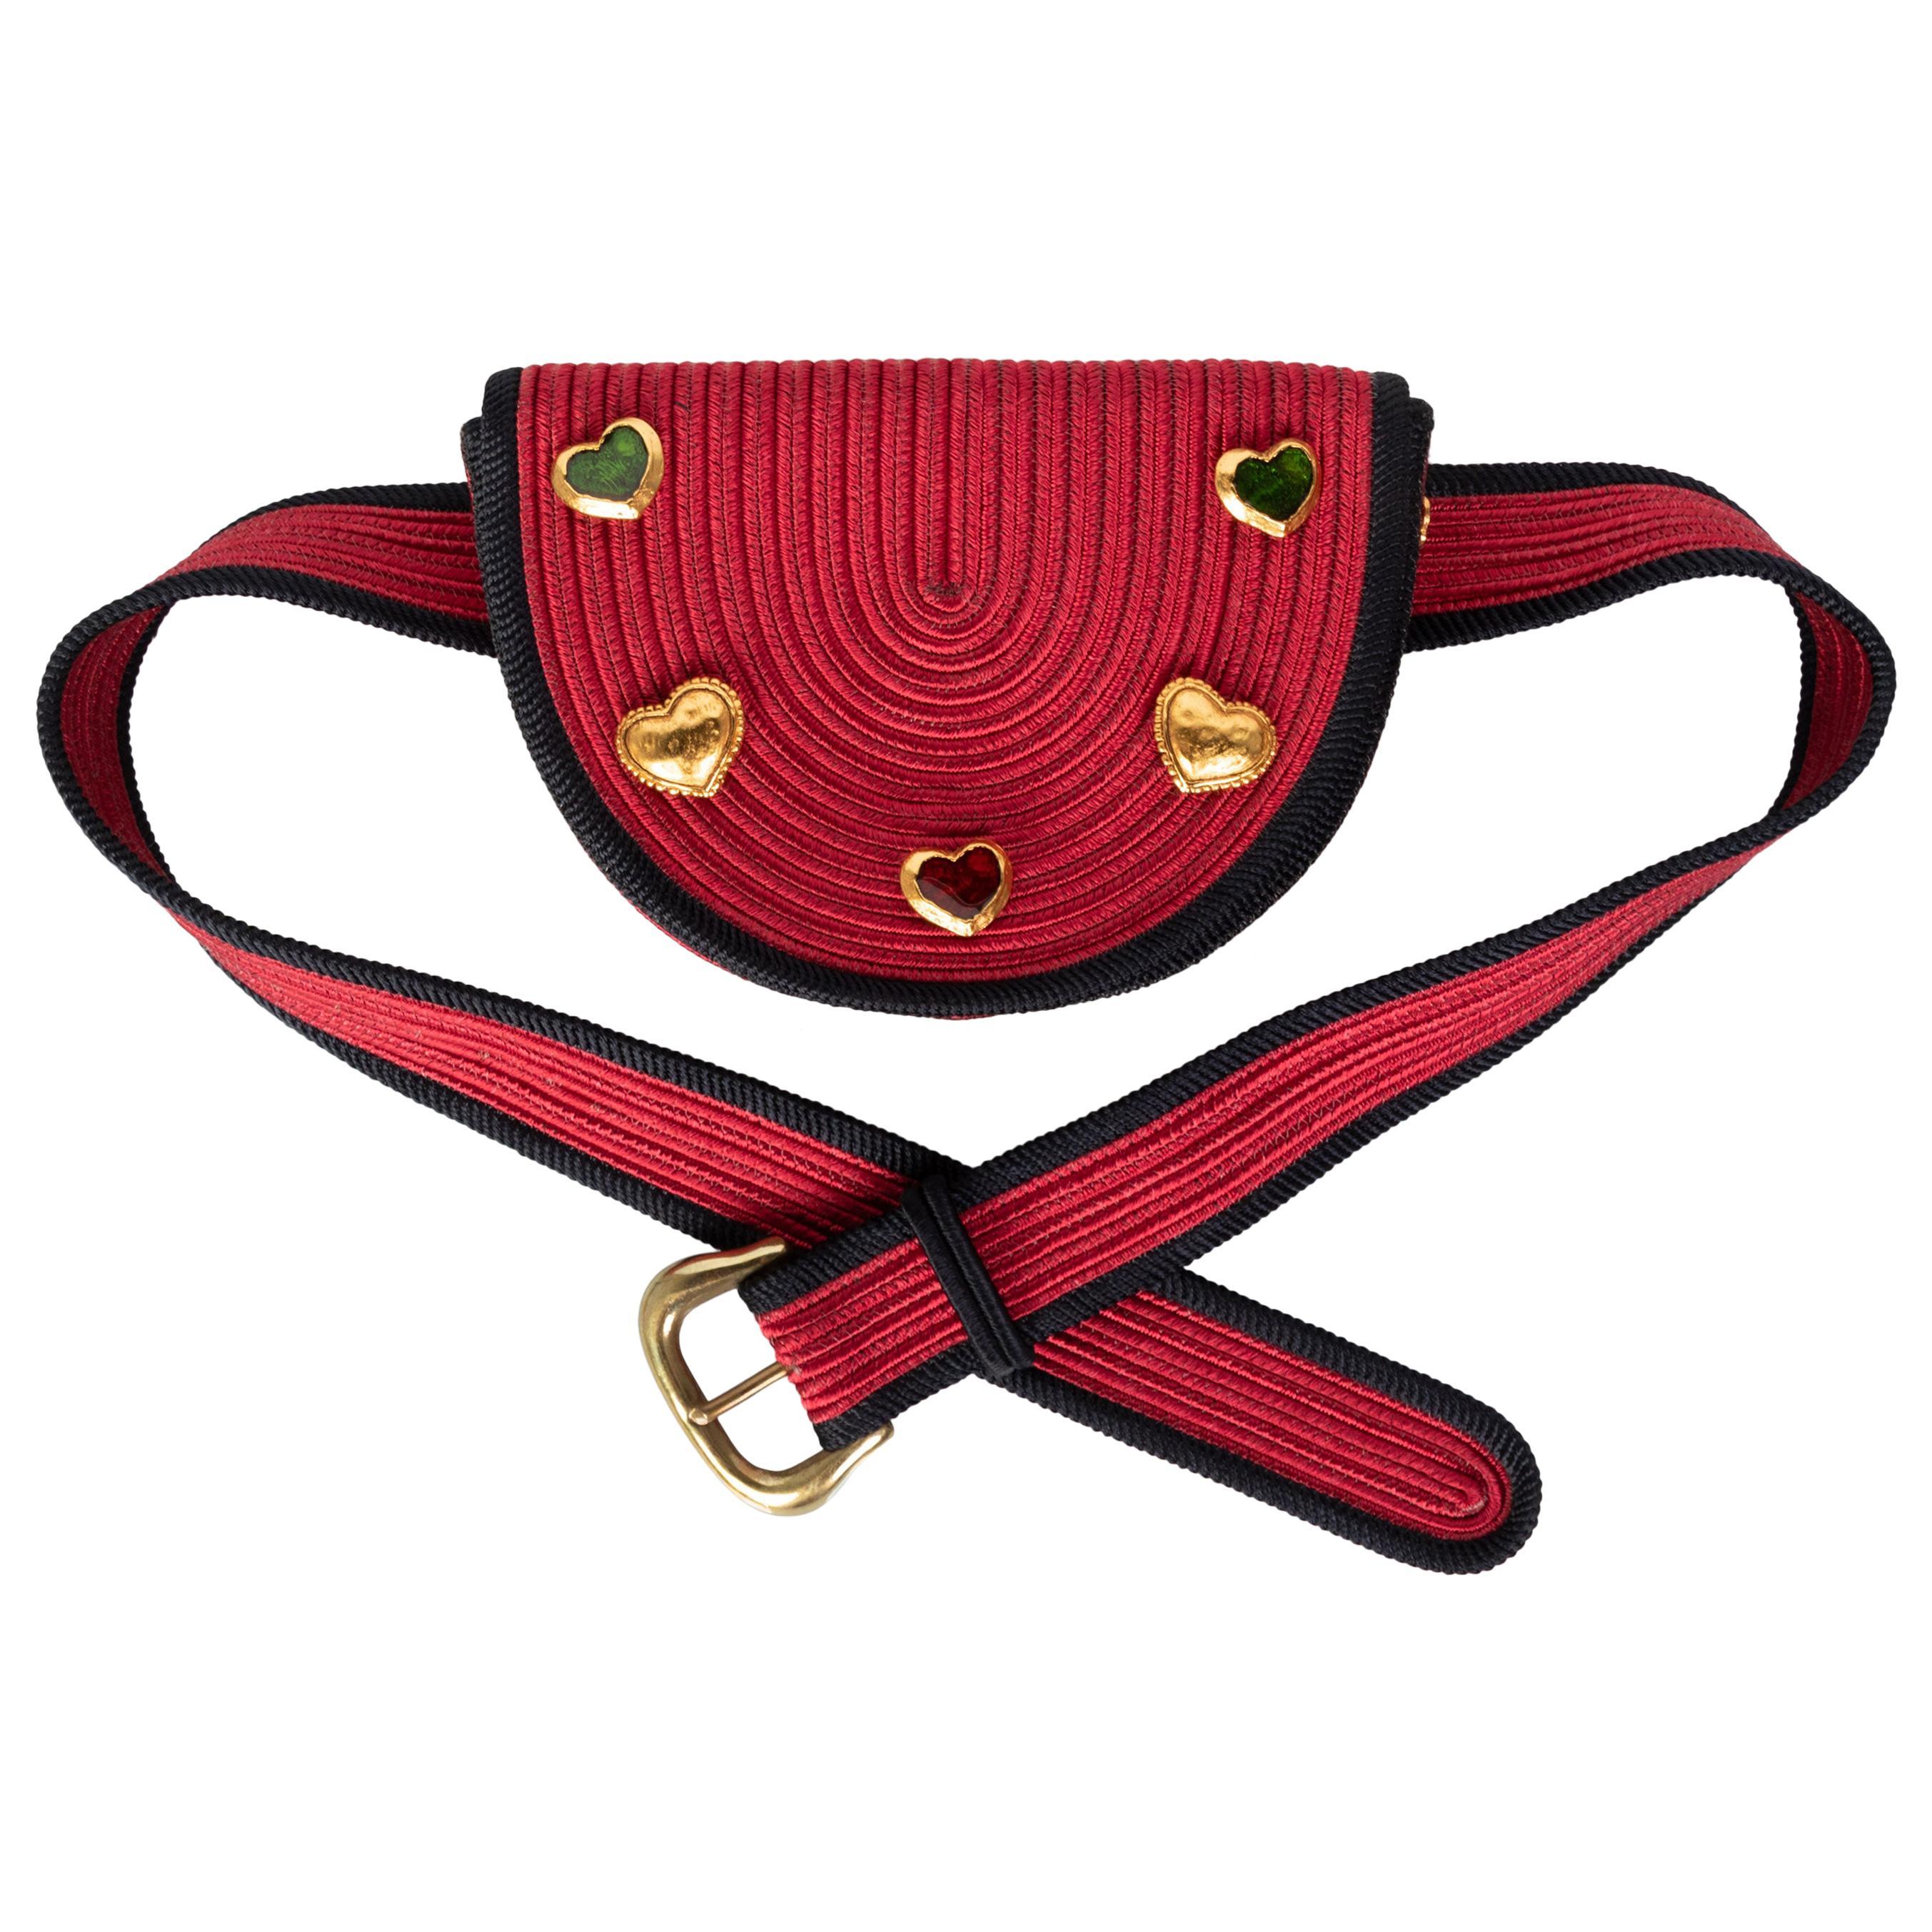 Yves Saint Laurent Red Black Passementerie Gripoix Hearts Clutch/ Belt Bag YSL